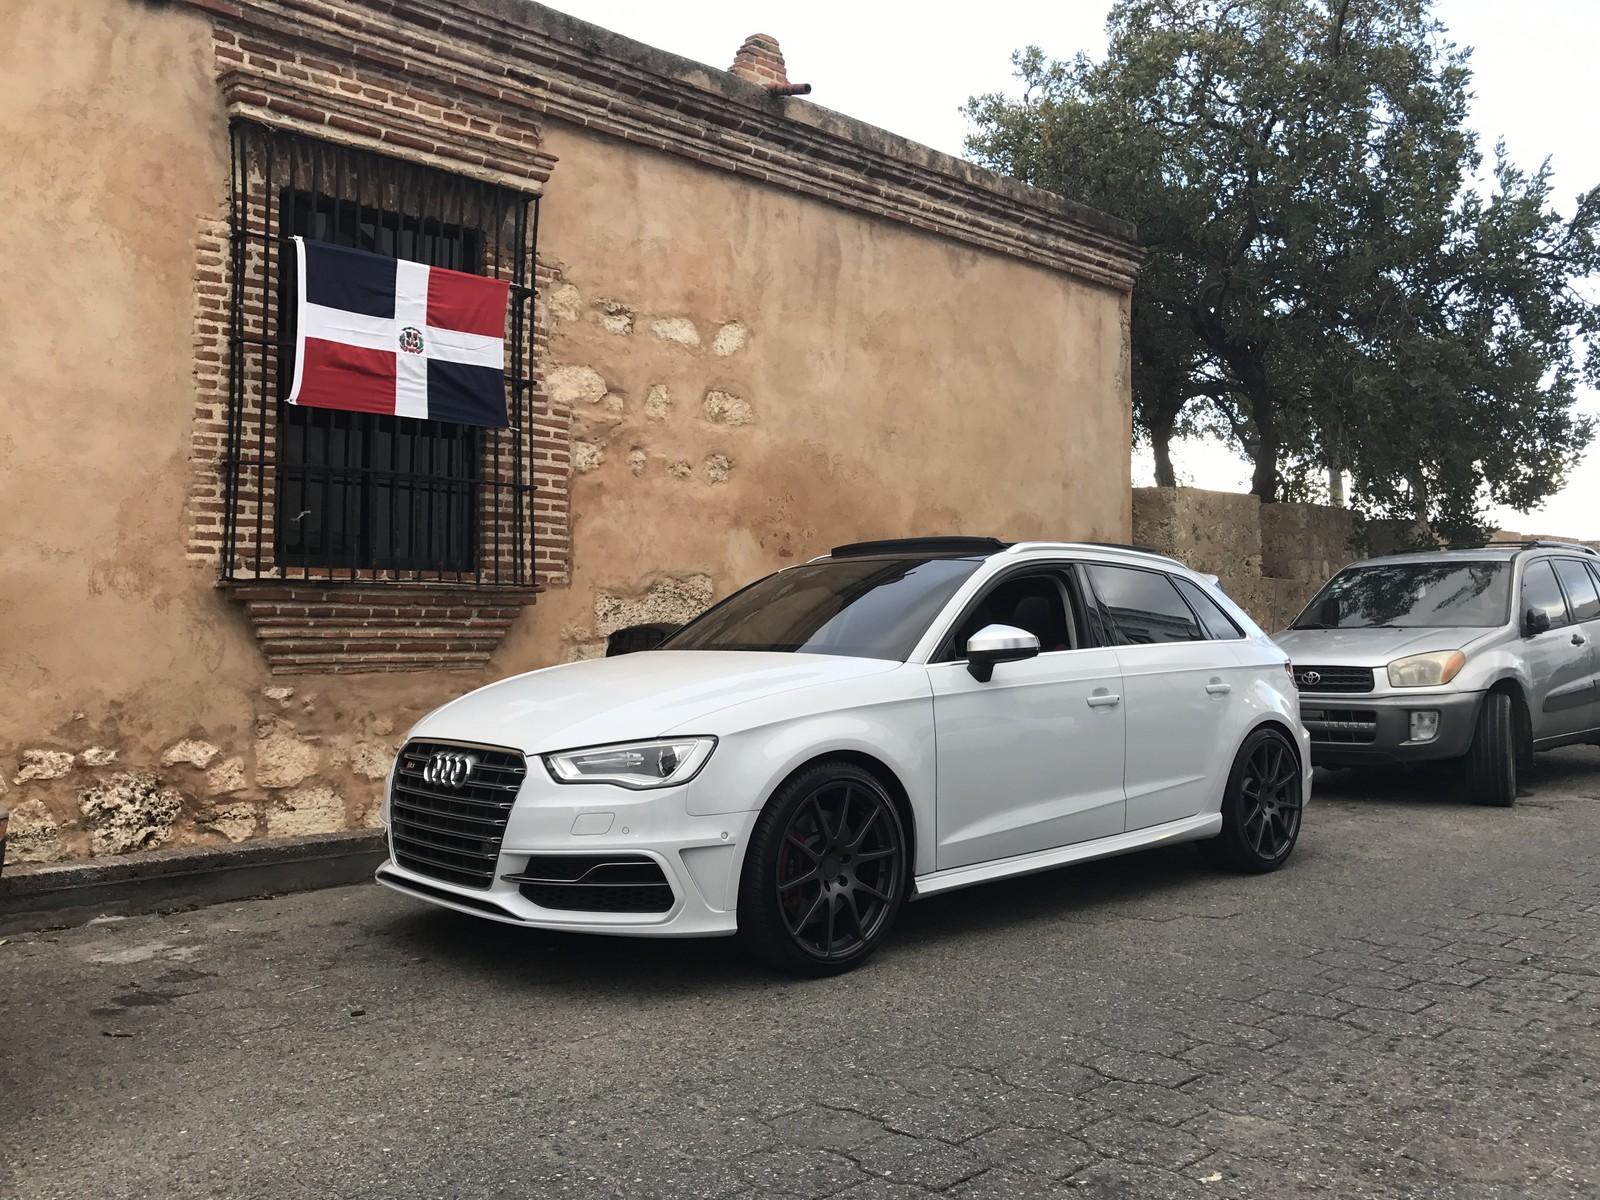 Audi S Mile Drag Racing Timeslip Specs DragTimescom - Audi s3 0 60